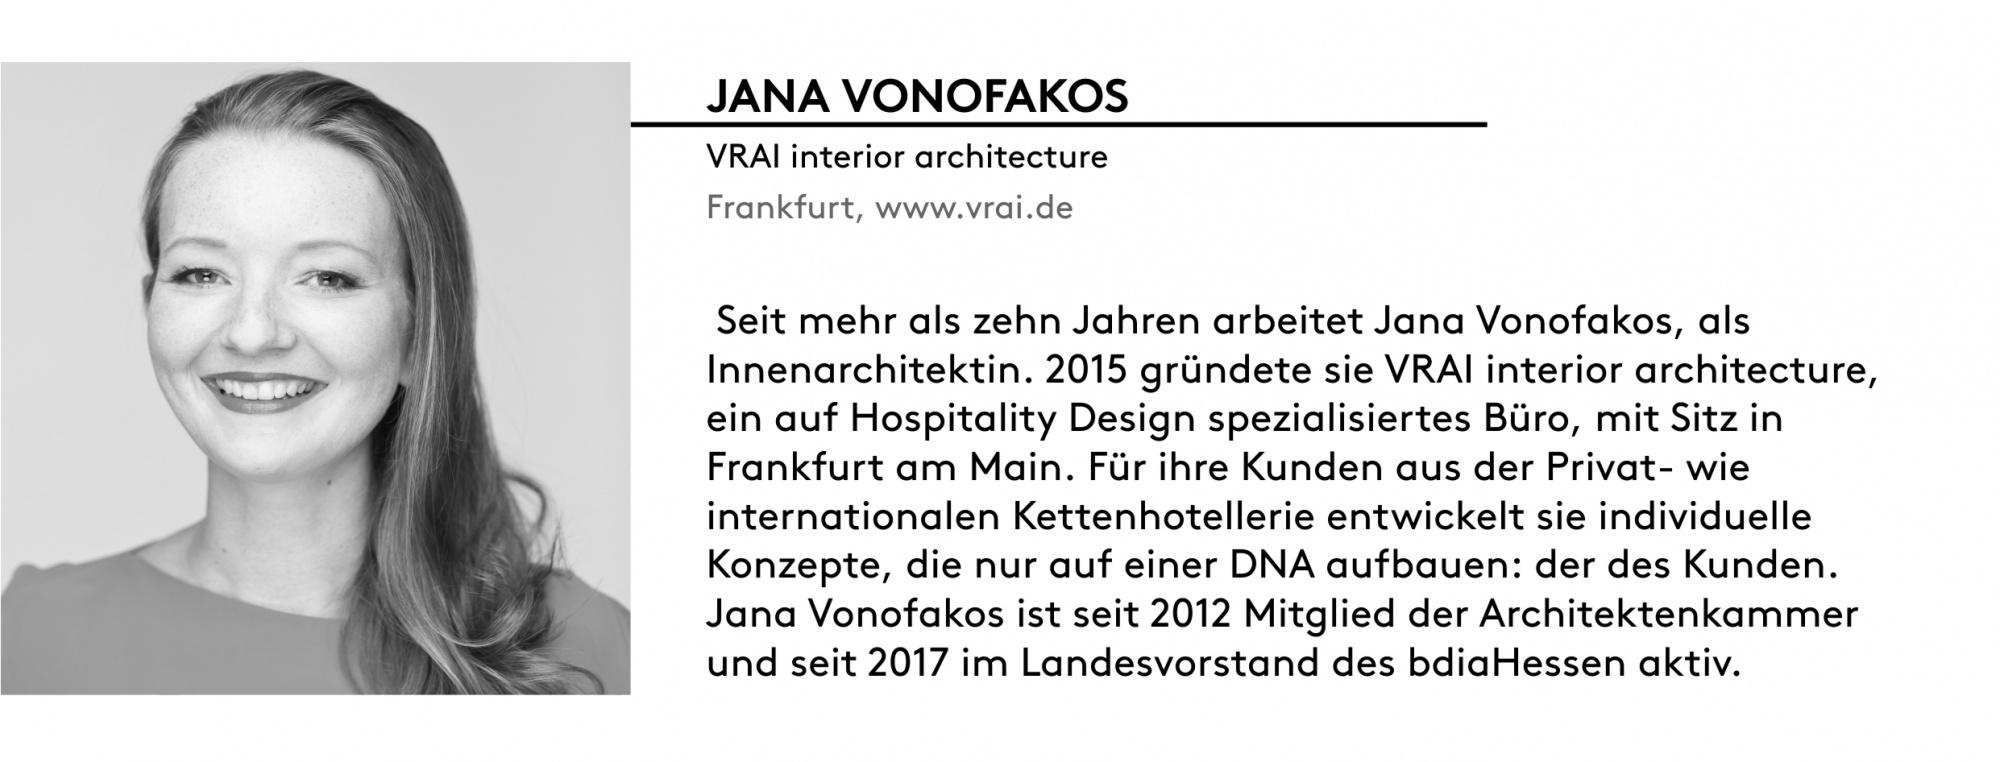 Guide_Jana Vonofakos